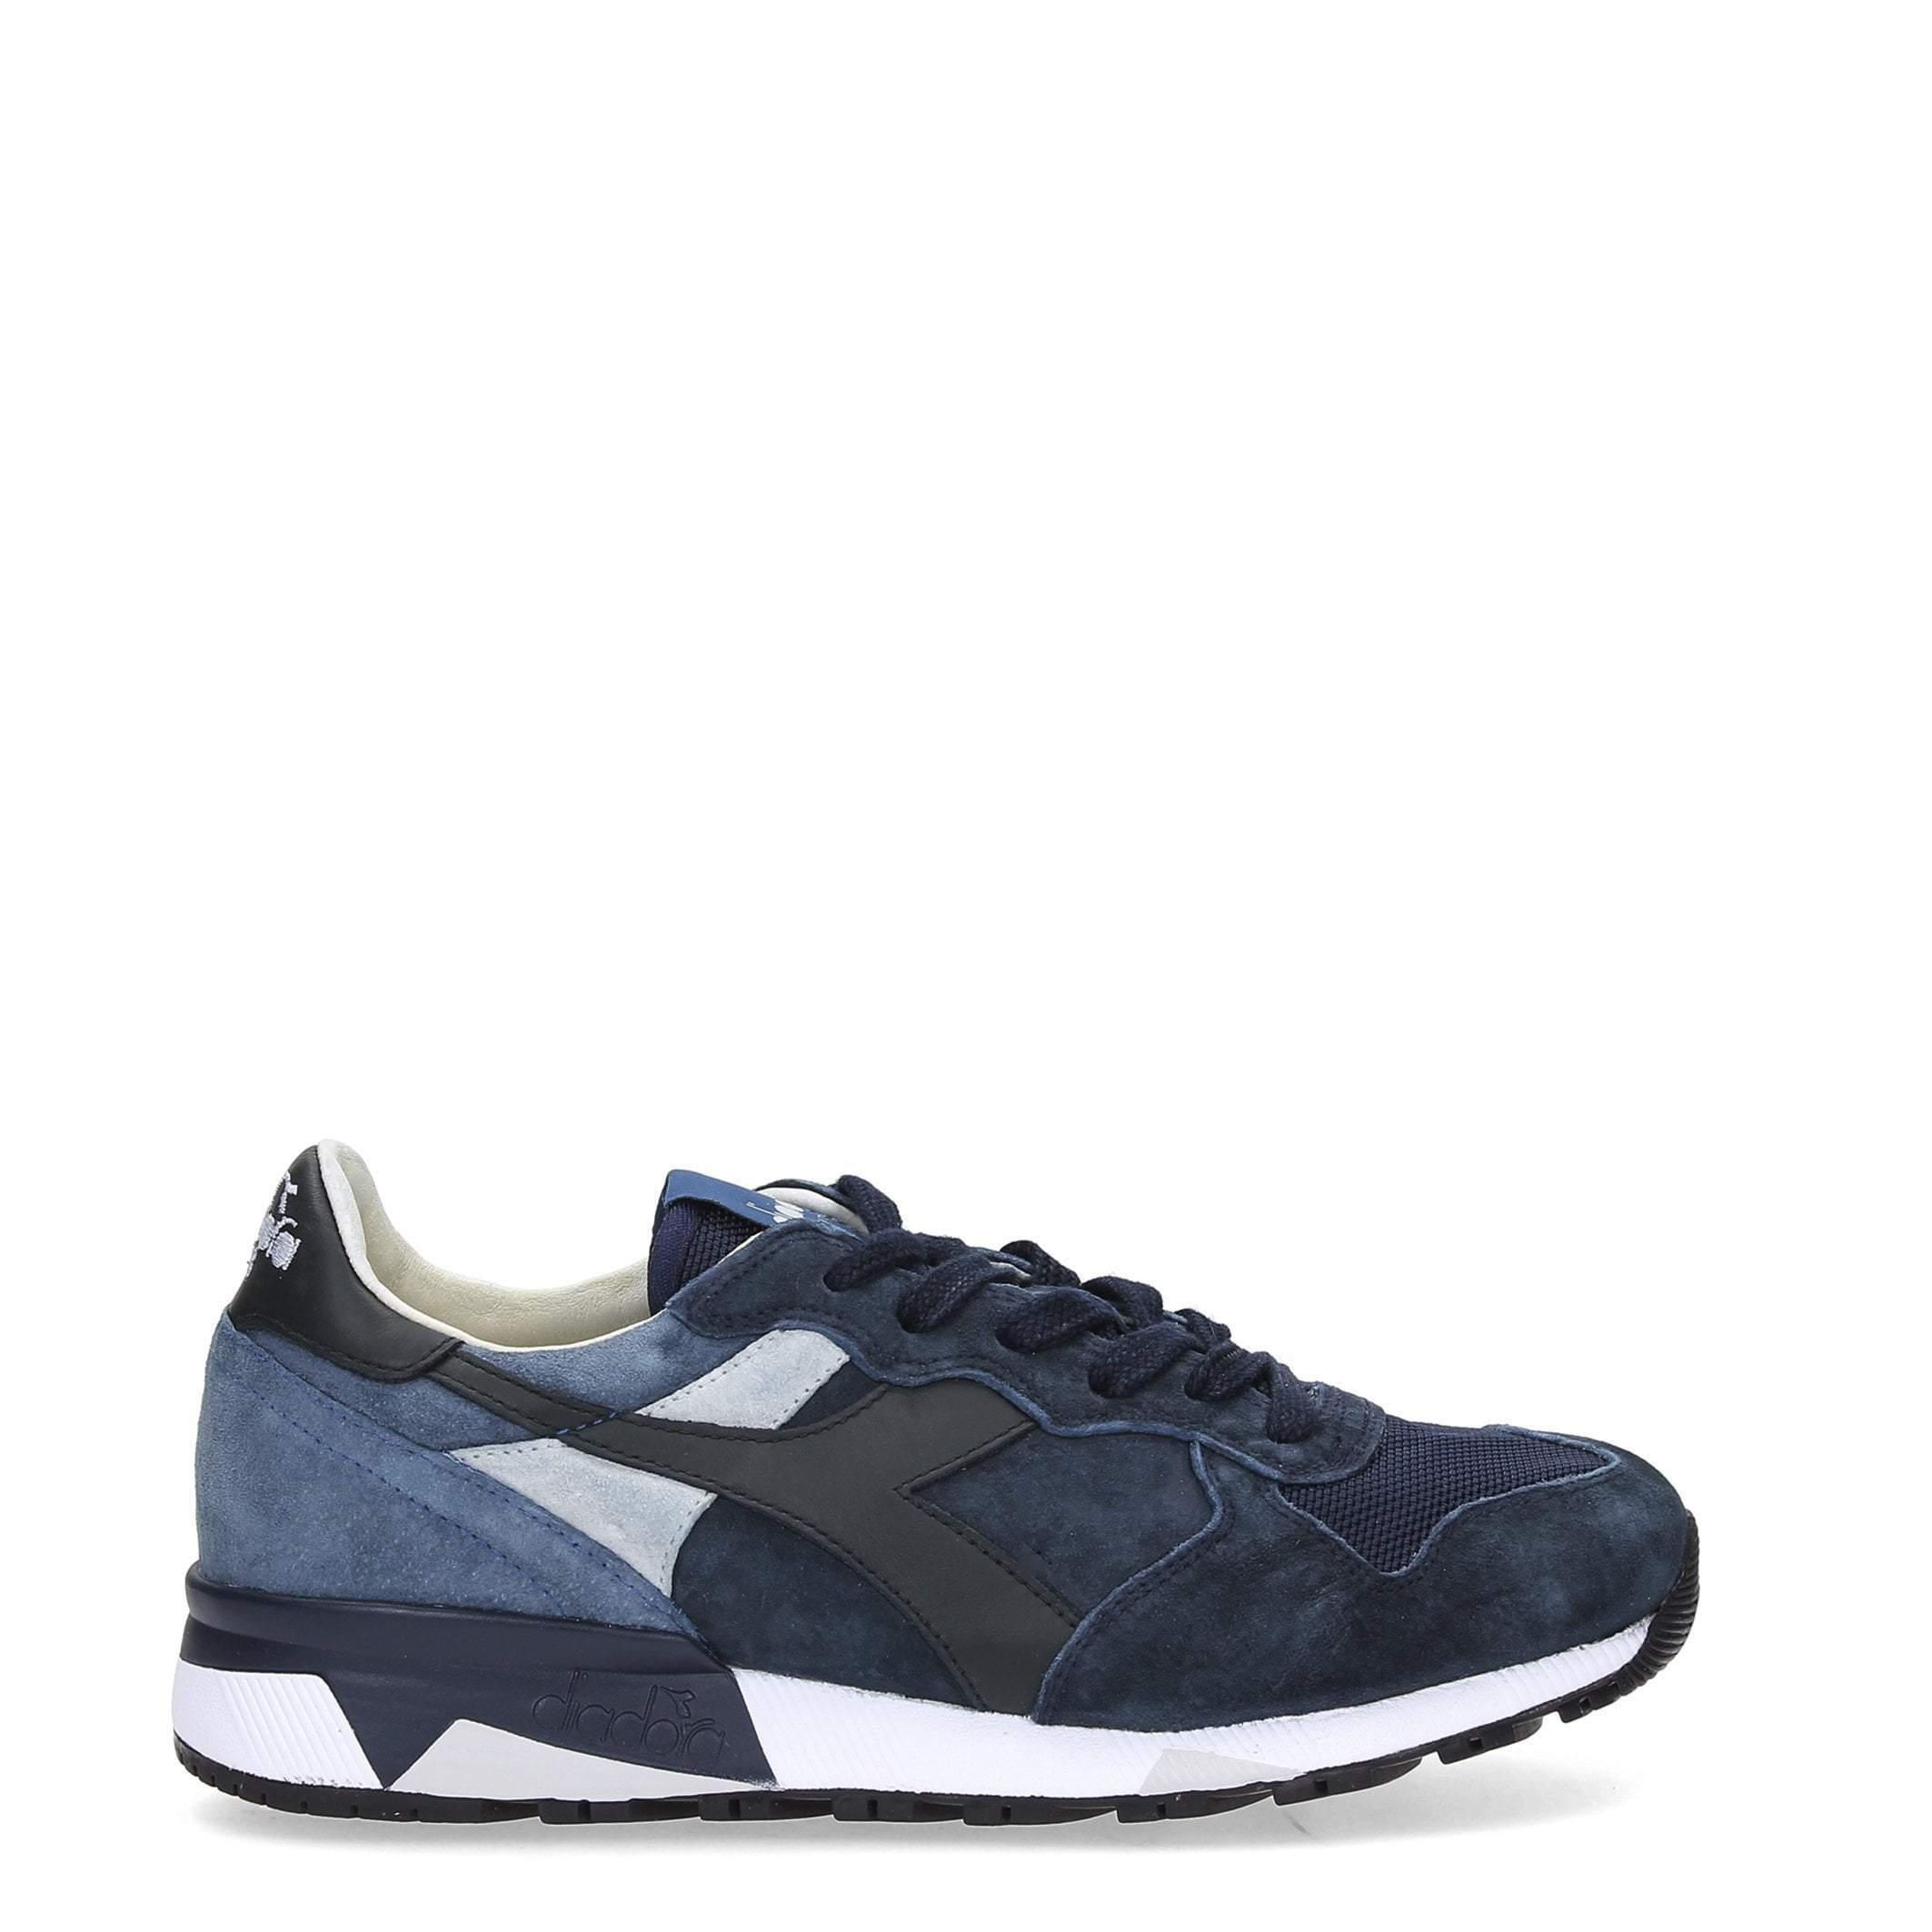 831d081dbb1 Diadora Heritage Trident 90 S Sneakers - Blue